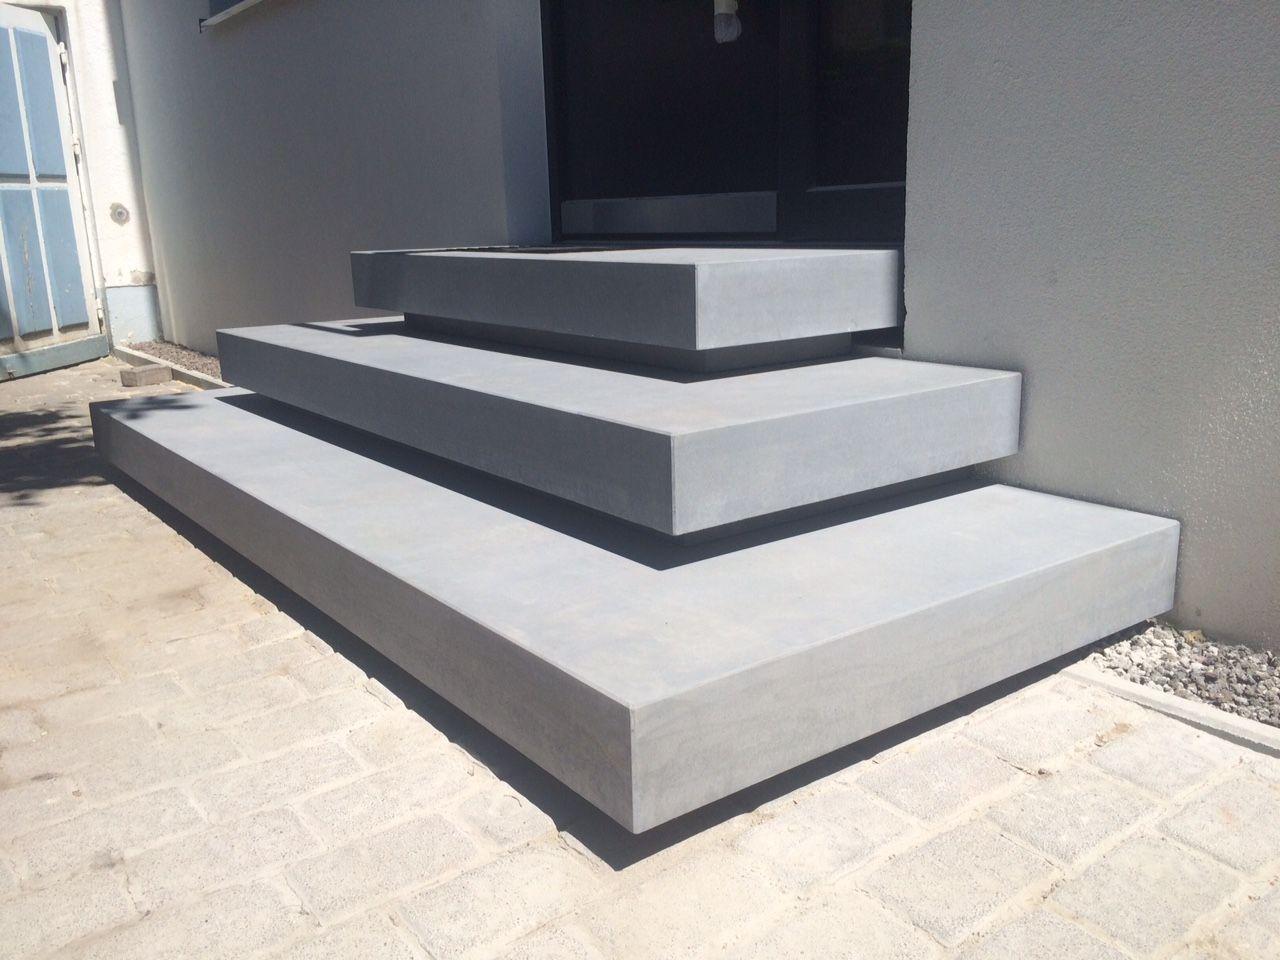 hr betondesign beton aussen | häuser | pinterest | betondesign